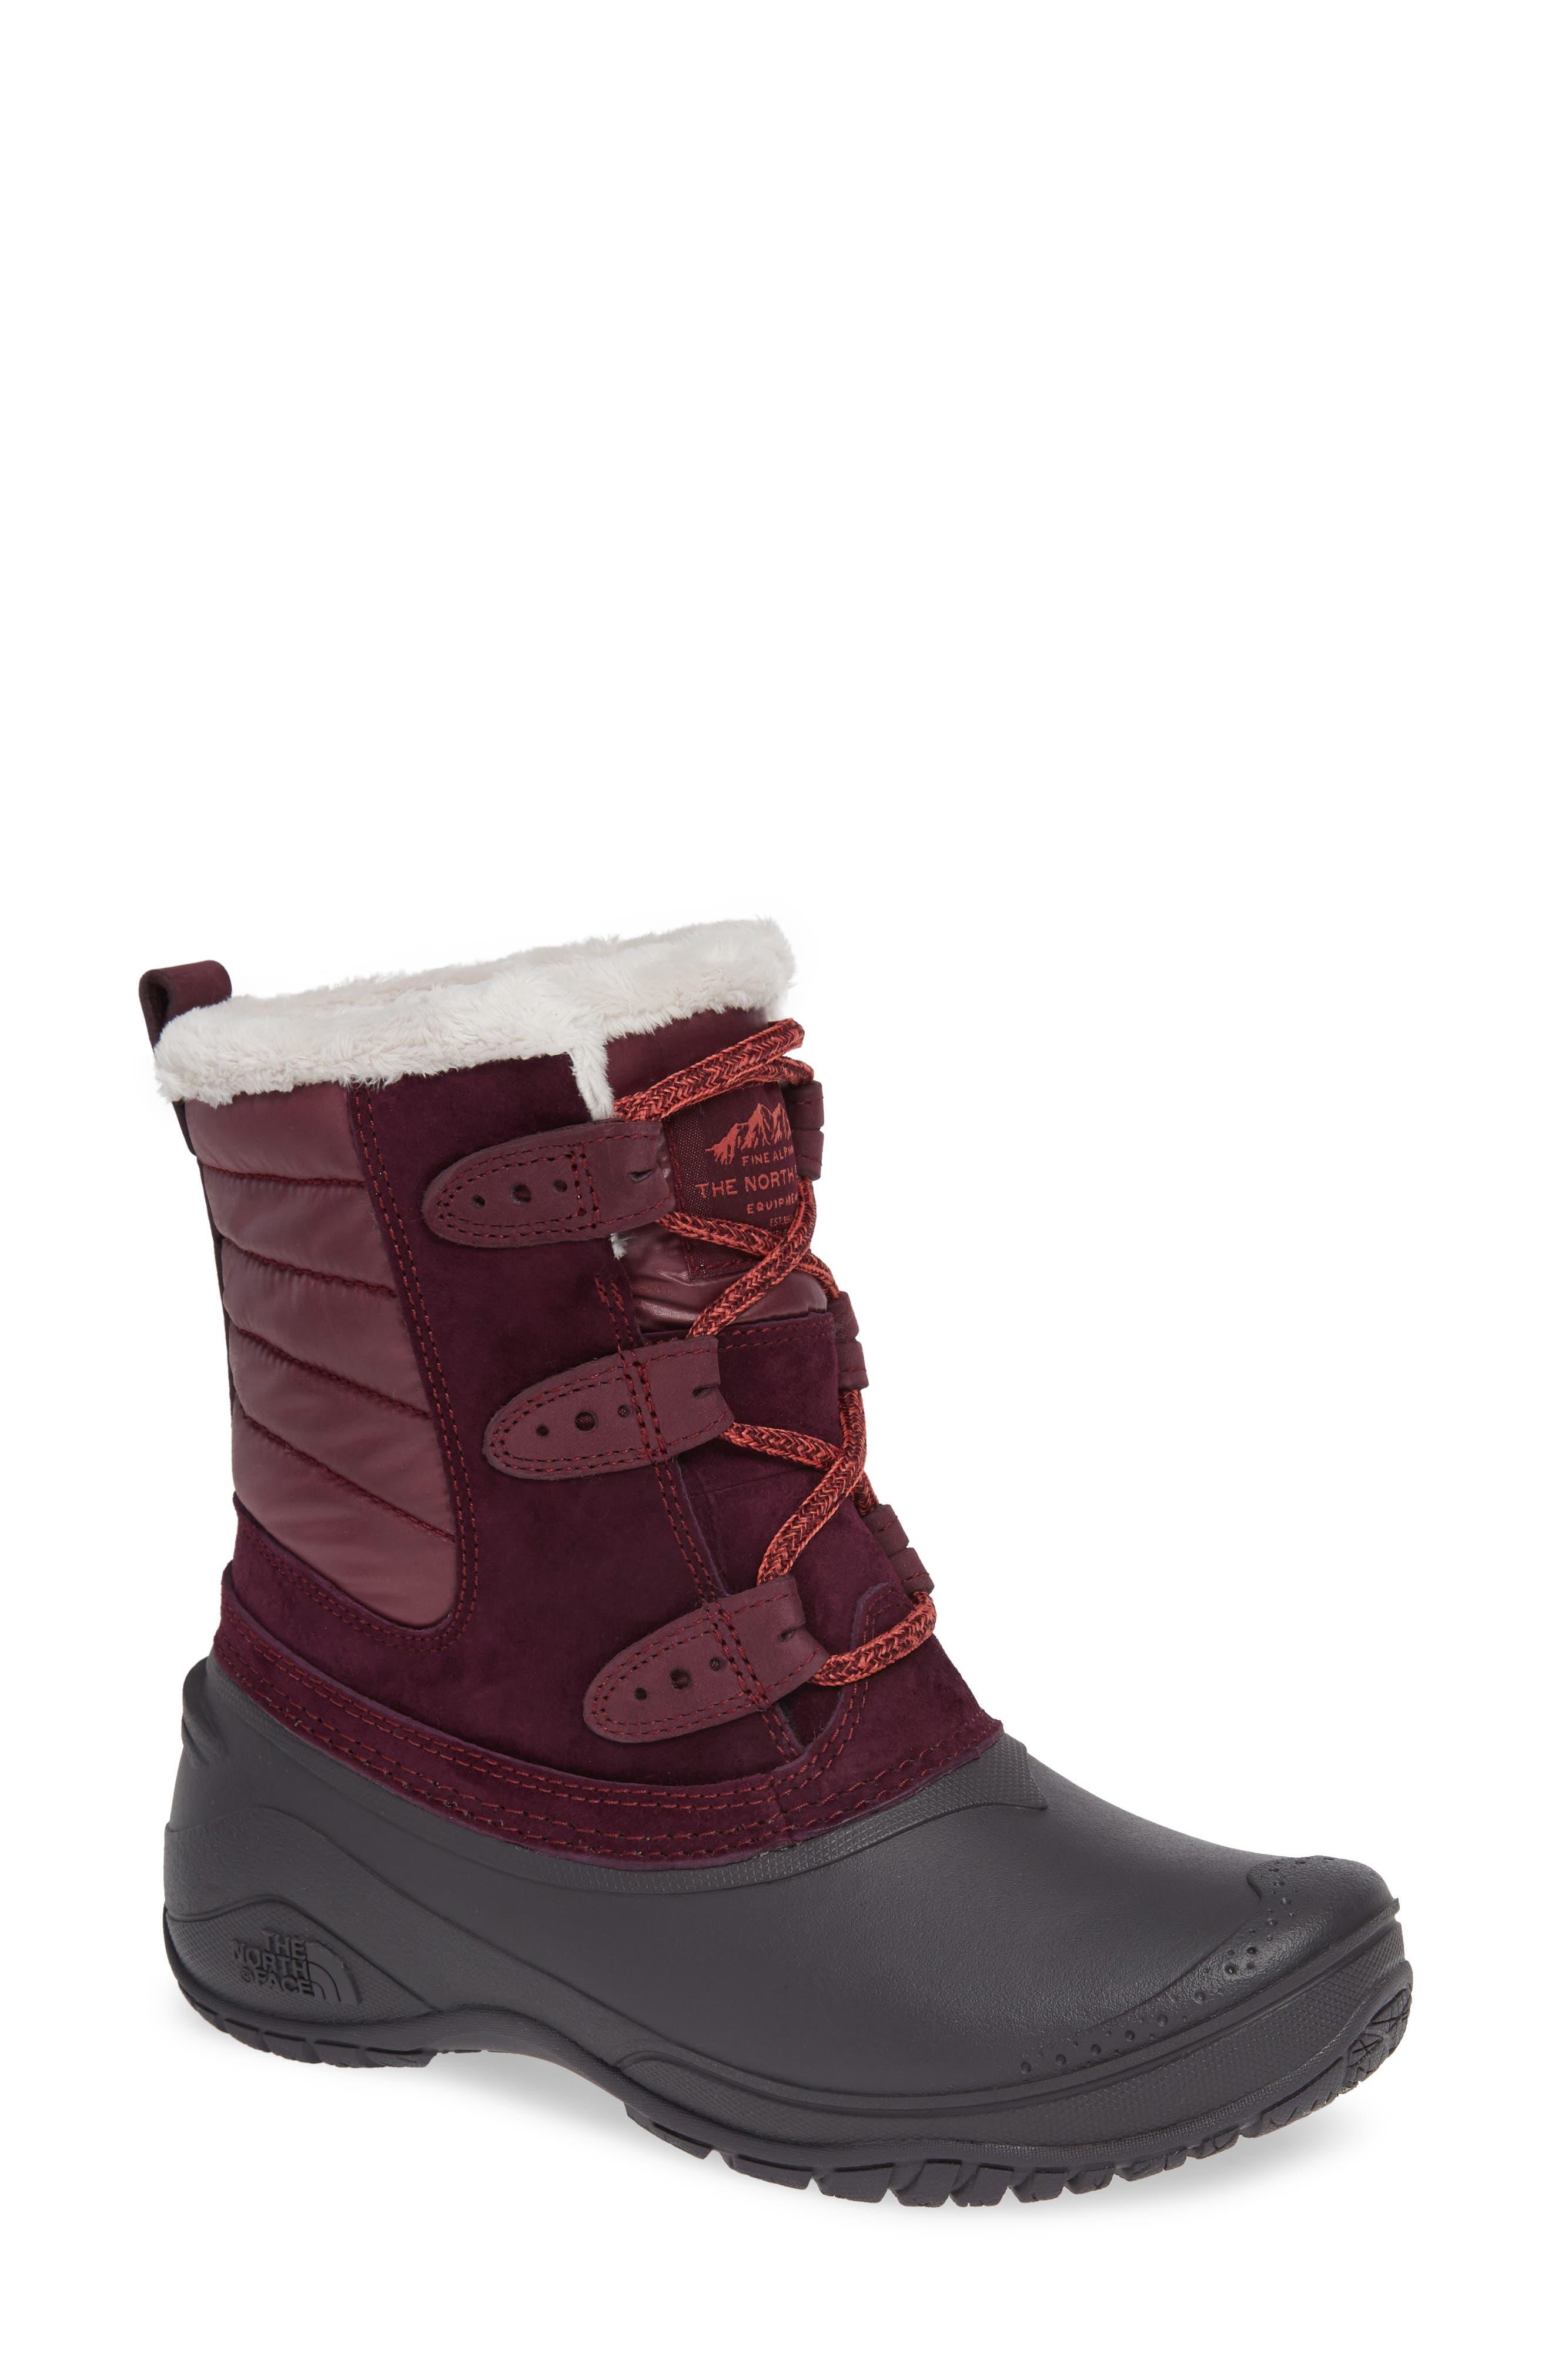 Shellista II Waterproof Boot,                         Main,                         color, 930